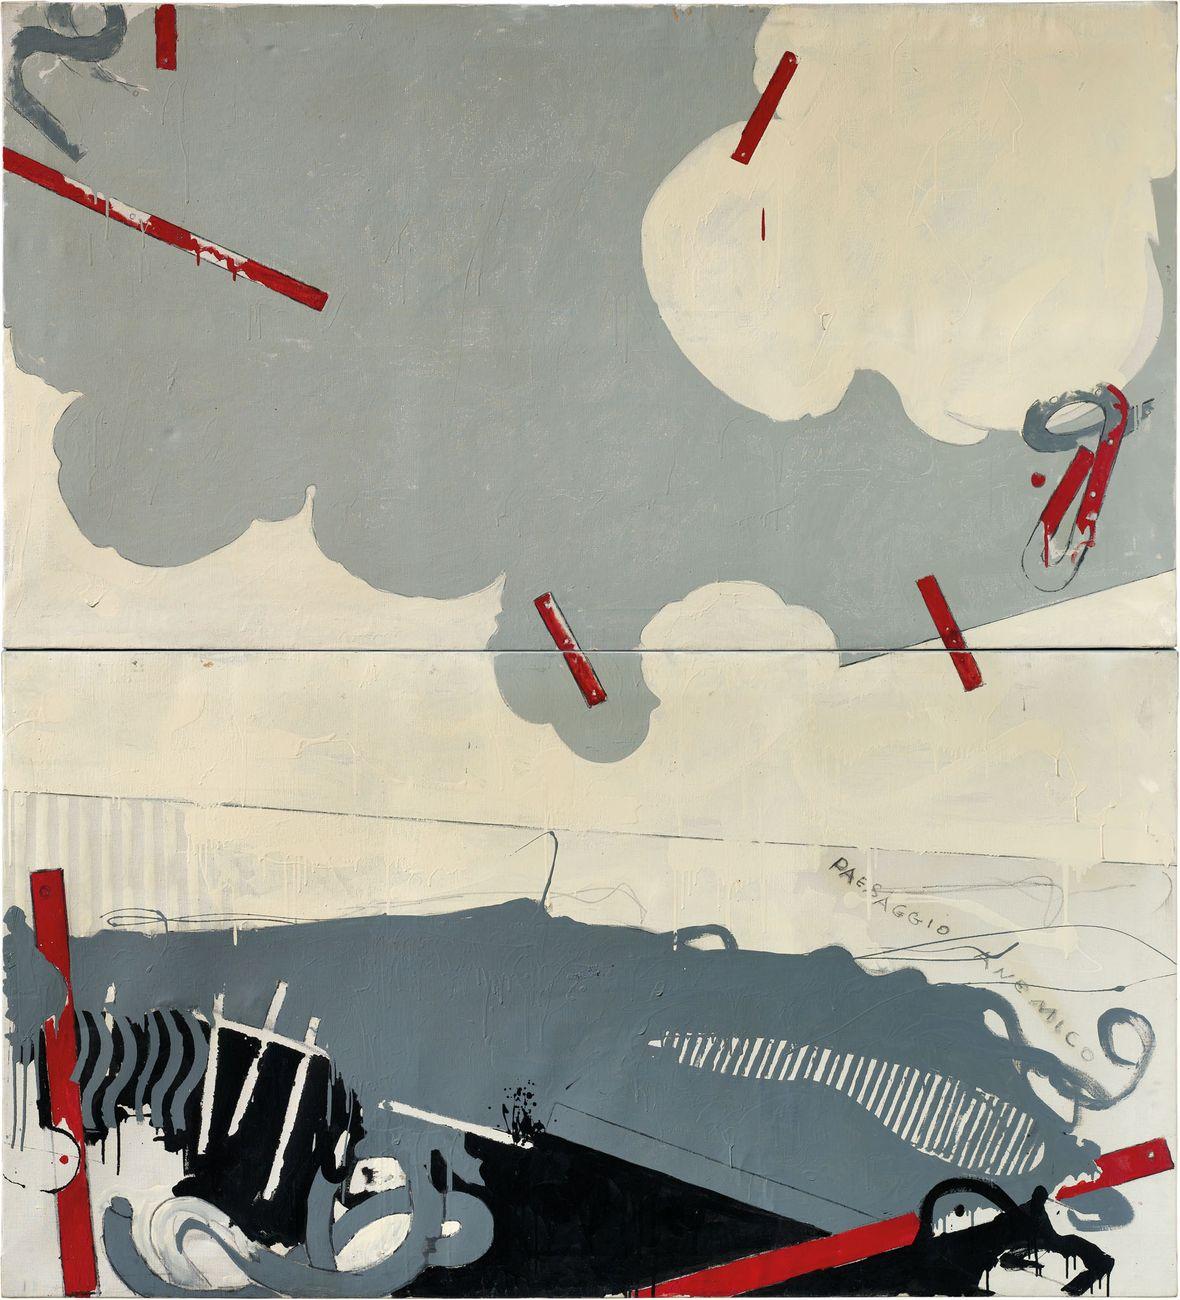 Mario Schifano, Paesaggio Anemico I, 1964. Courtesy Christie's Images Ltd. 2020